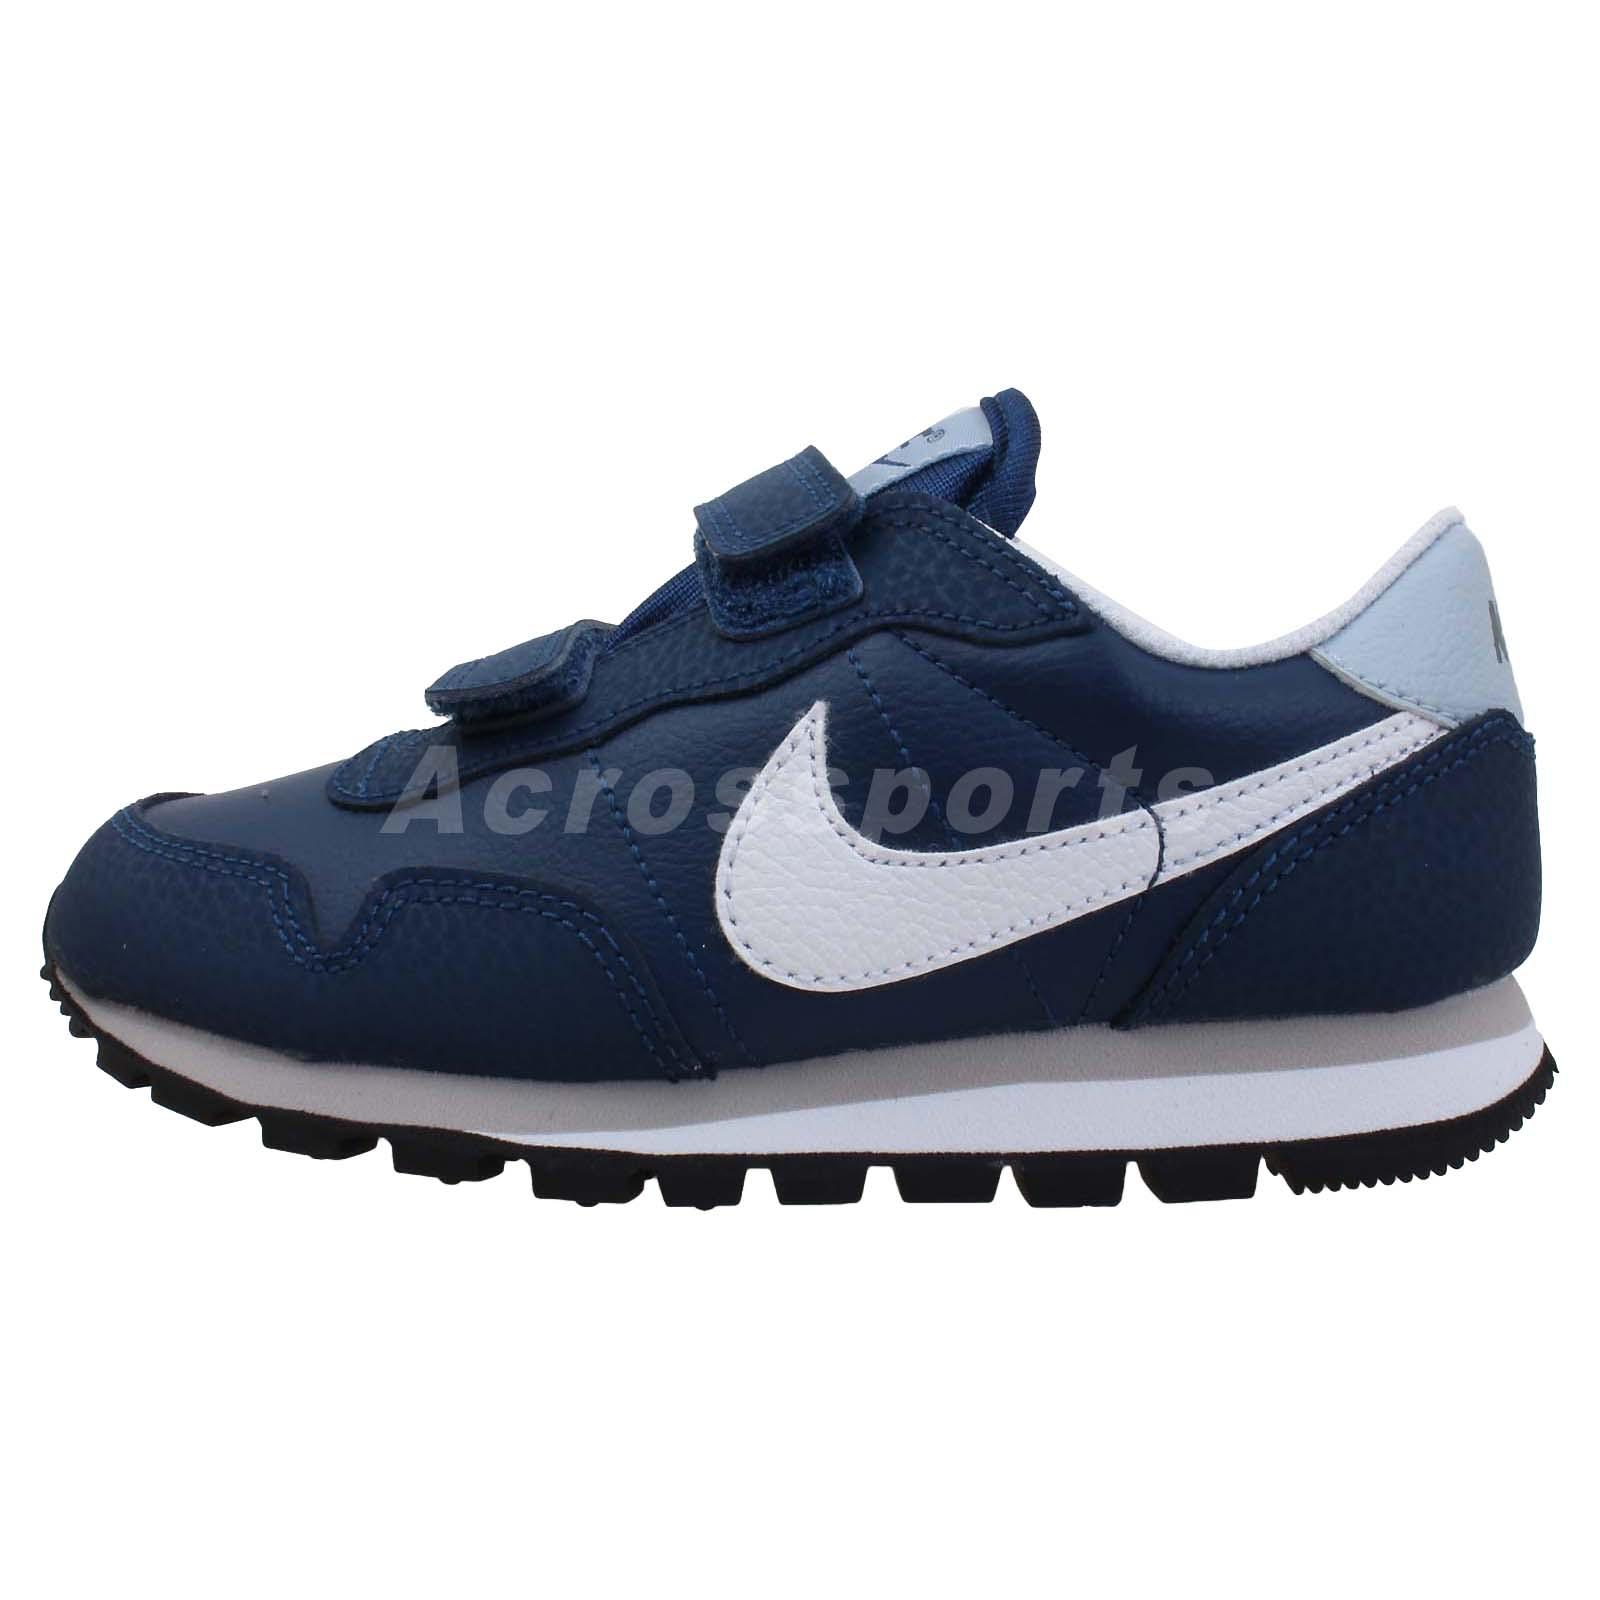 Nike Metro Plus Psv Navy Blue Velcro Preschool Kids Running Shoes